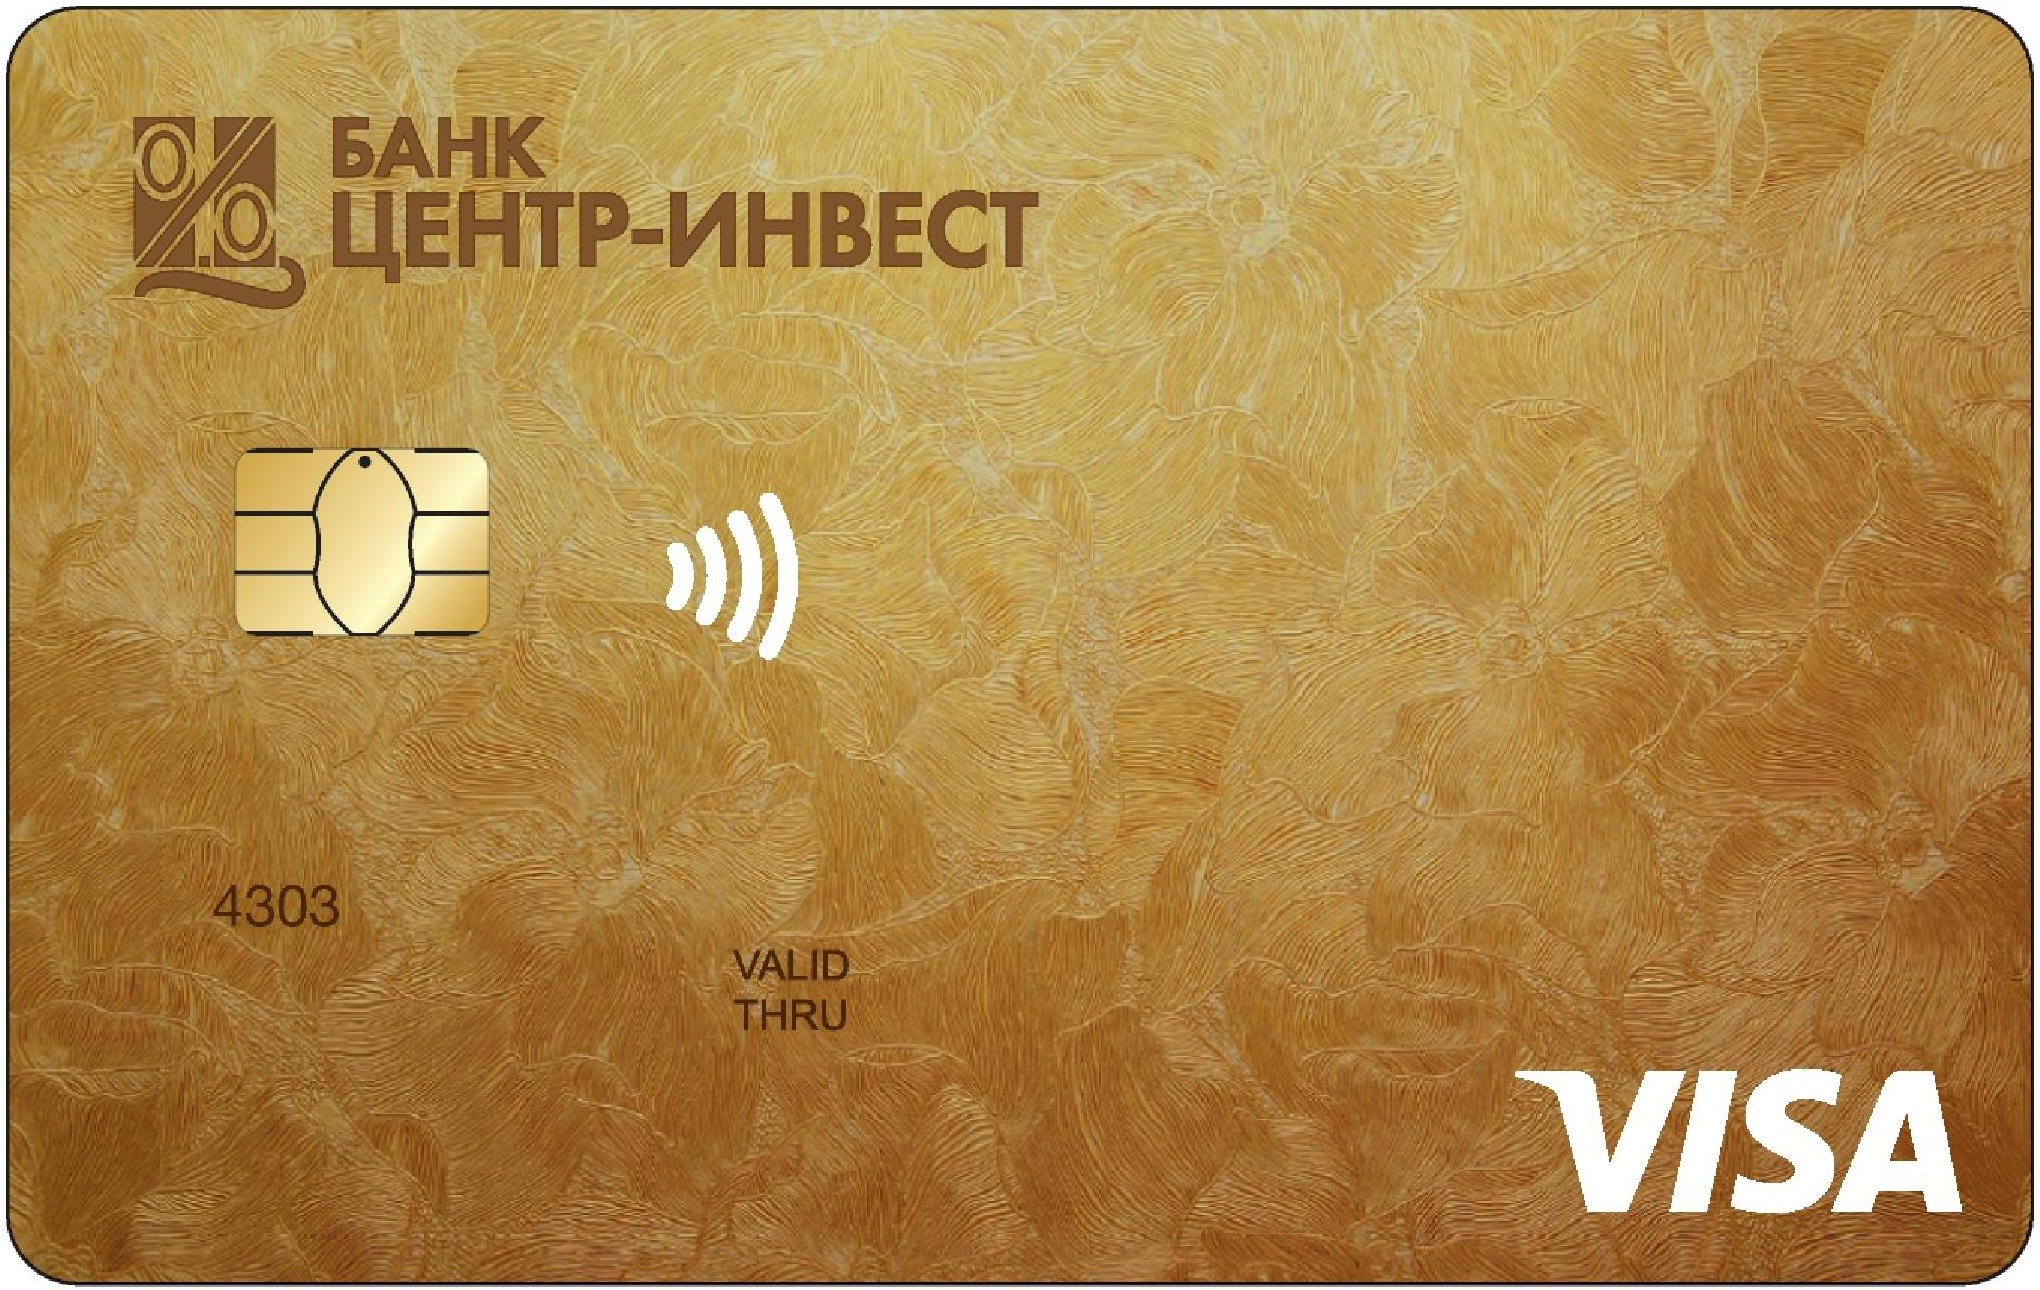 Центр Инвест кредитная карта